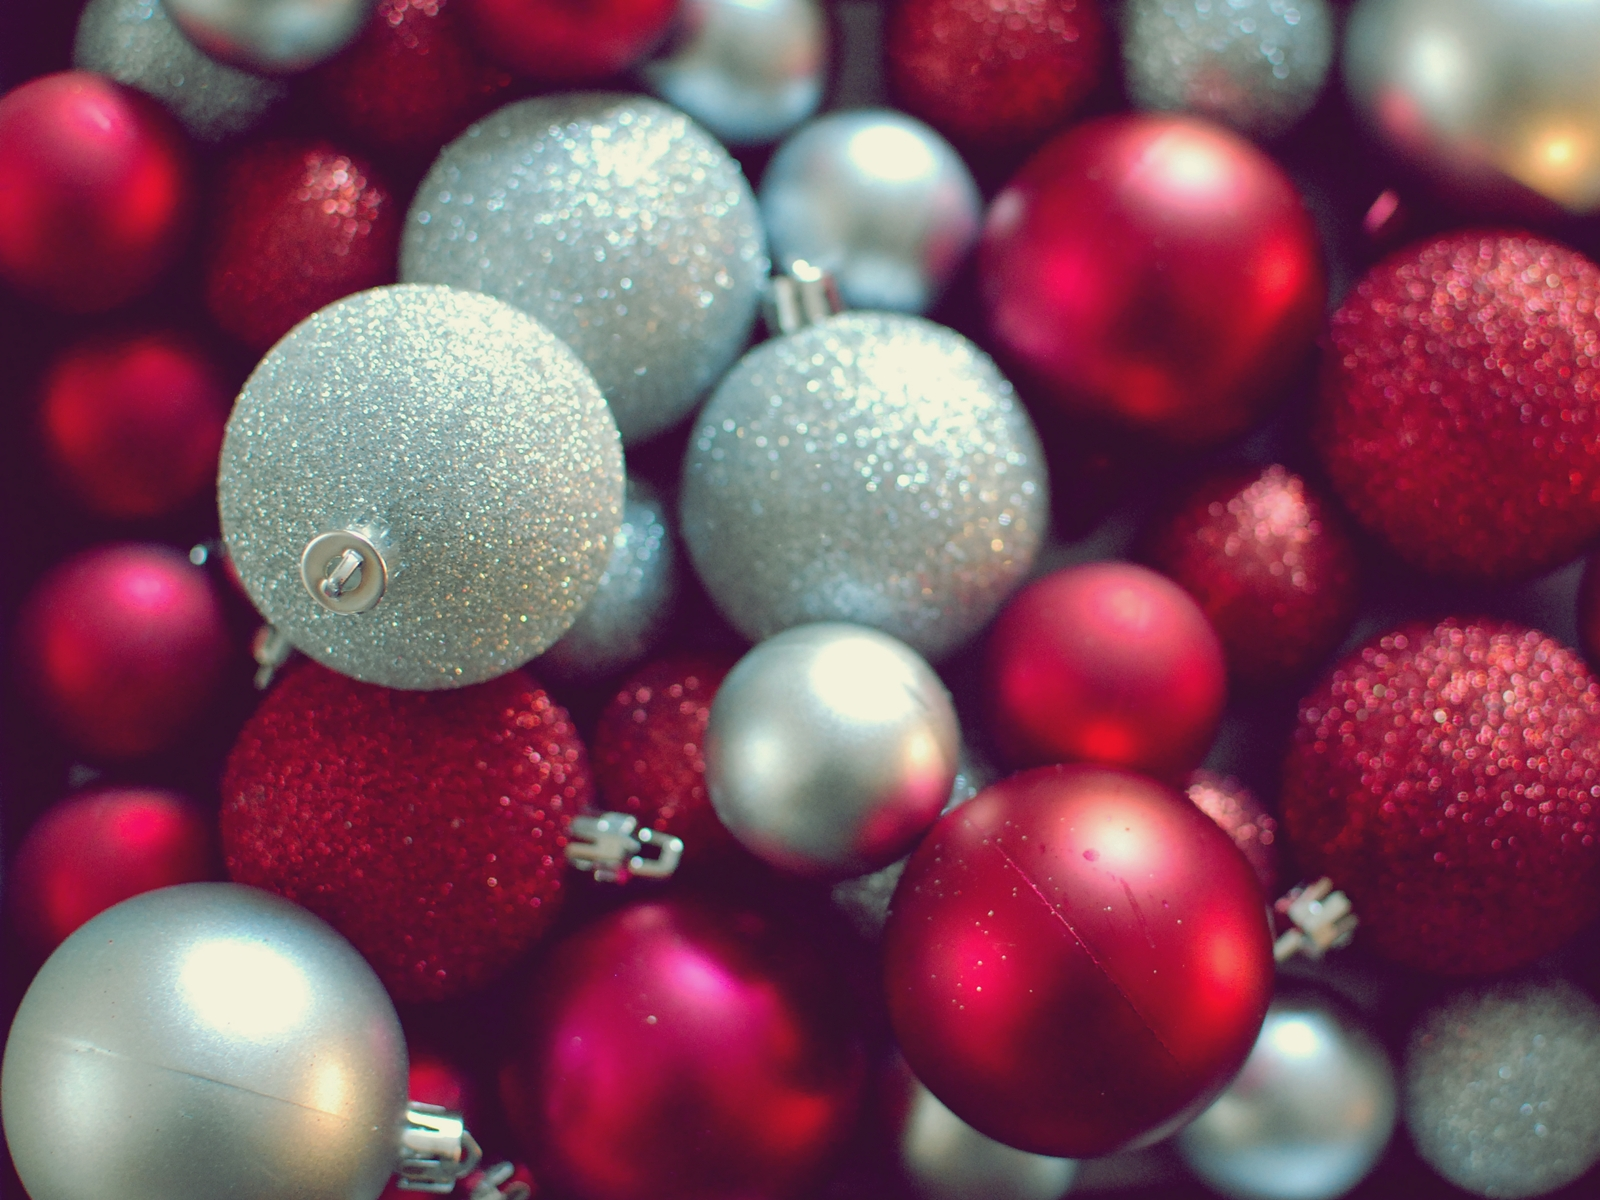 67 Christmas Ornaments Wallpaper On Wallpapersafari